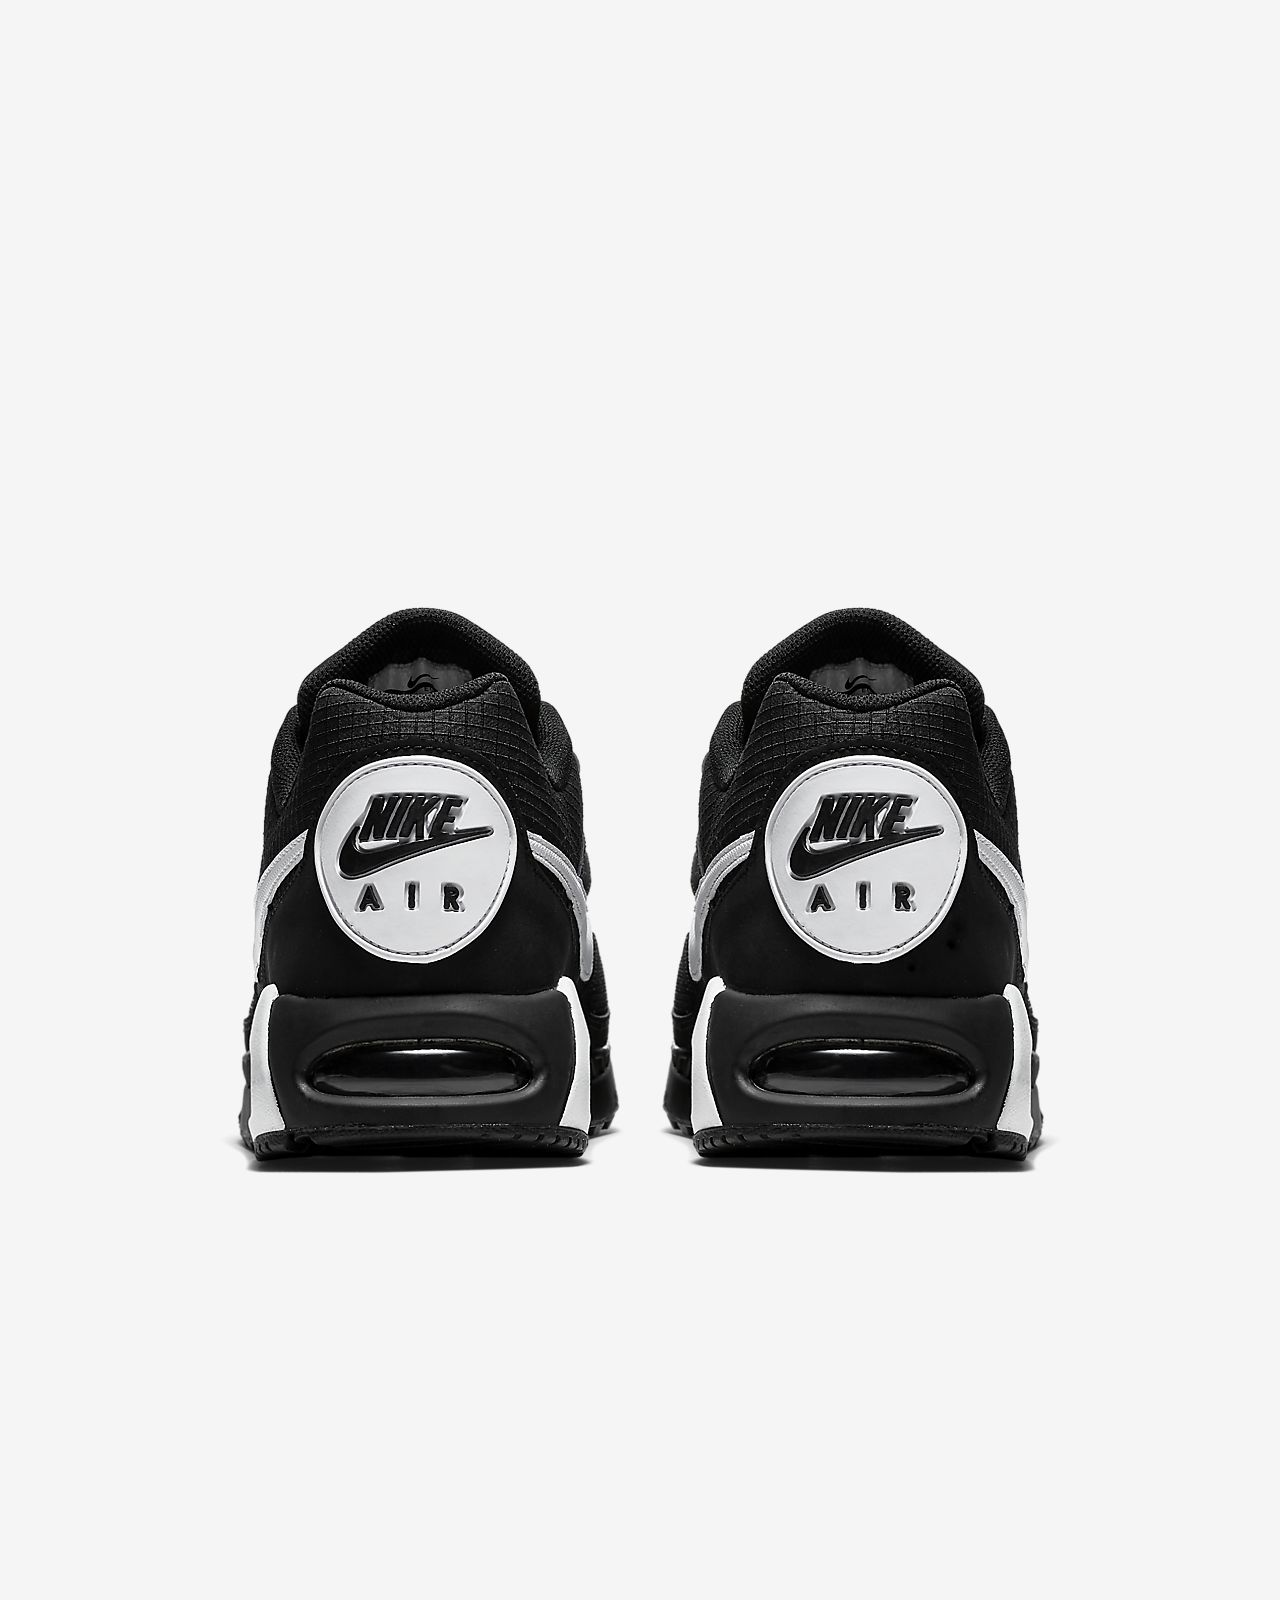 Nike Air Max IVO Herenschoen